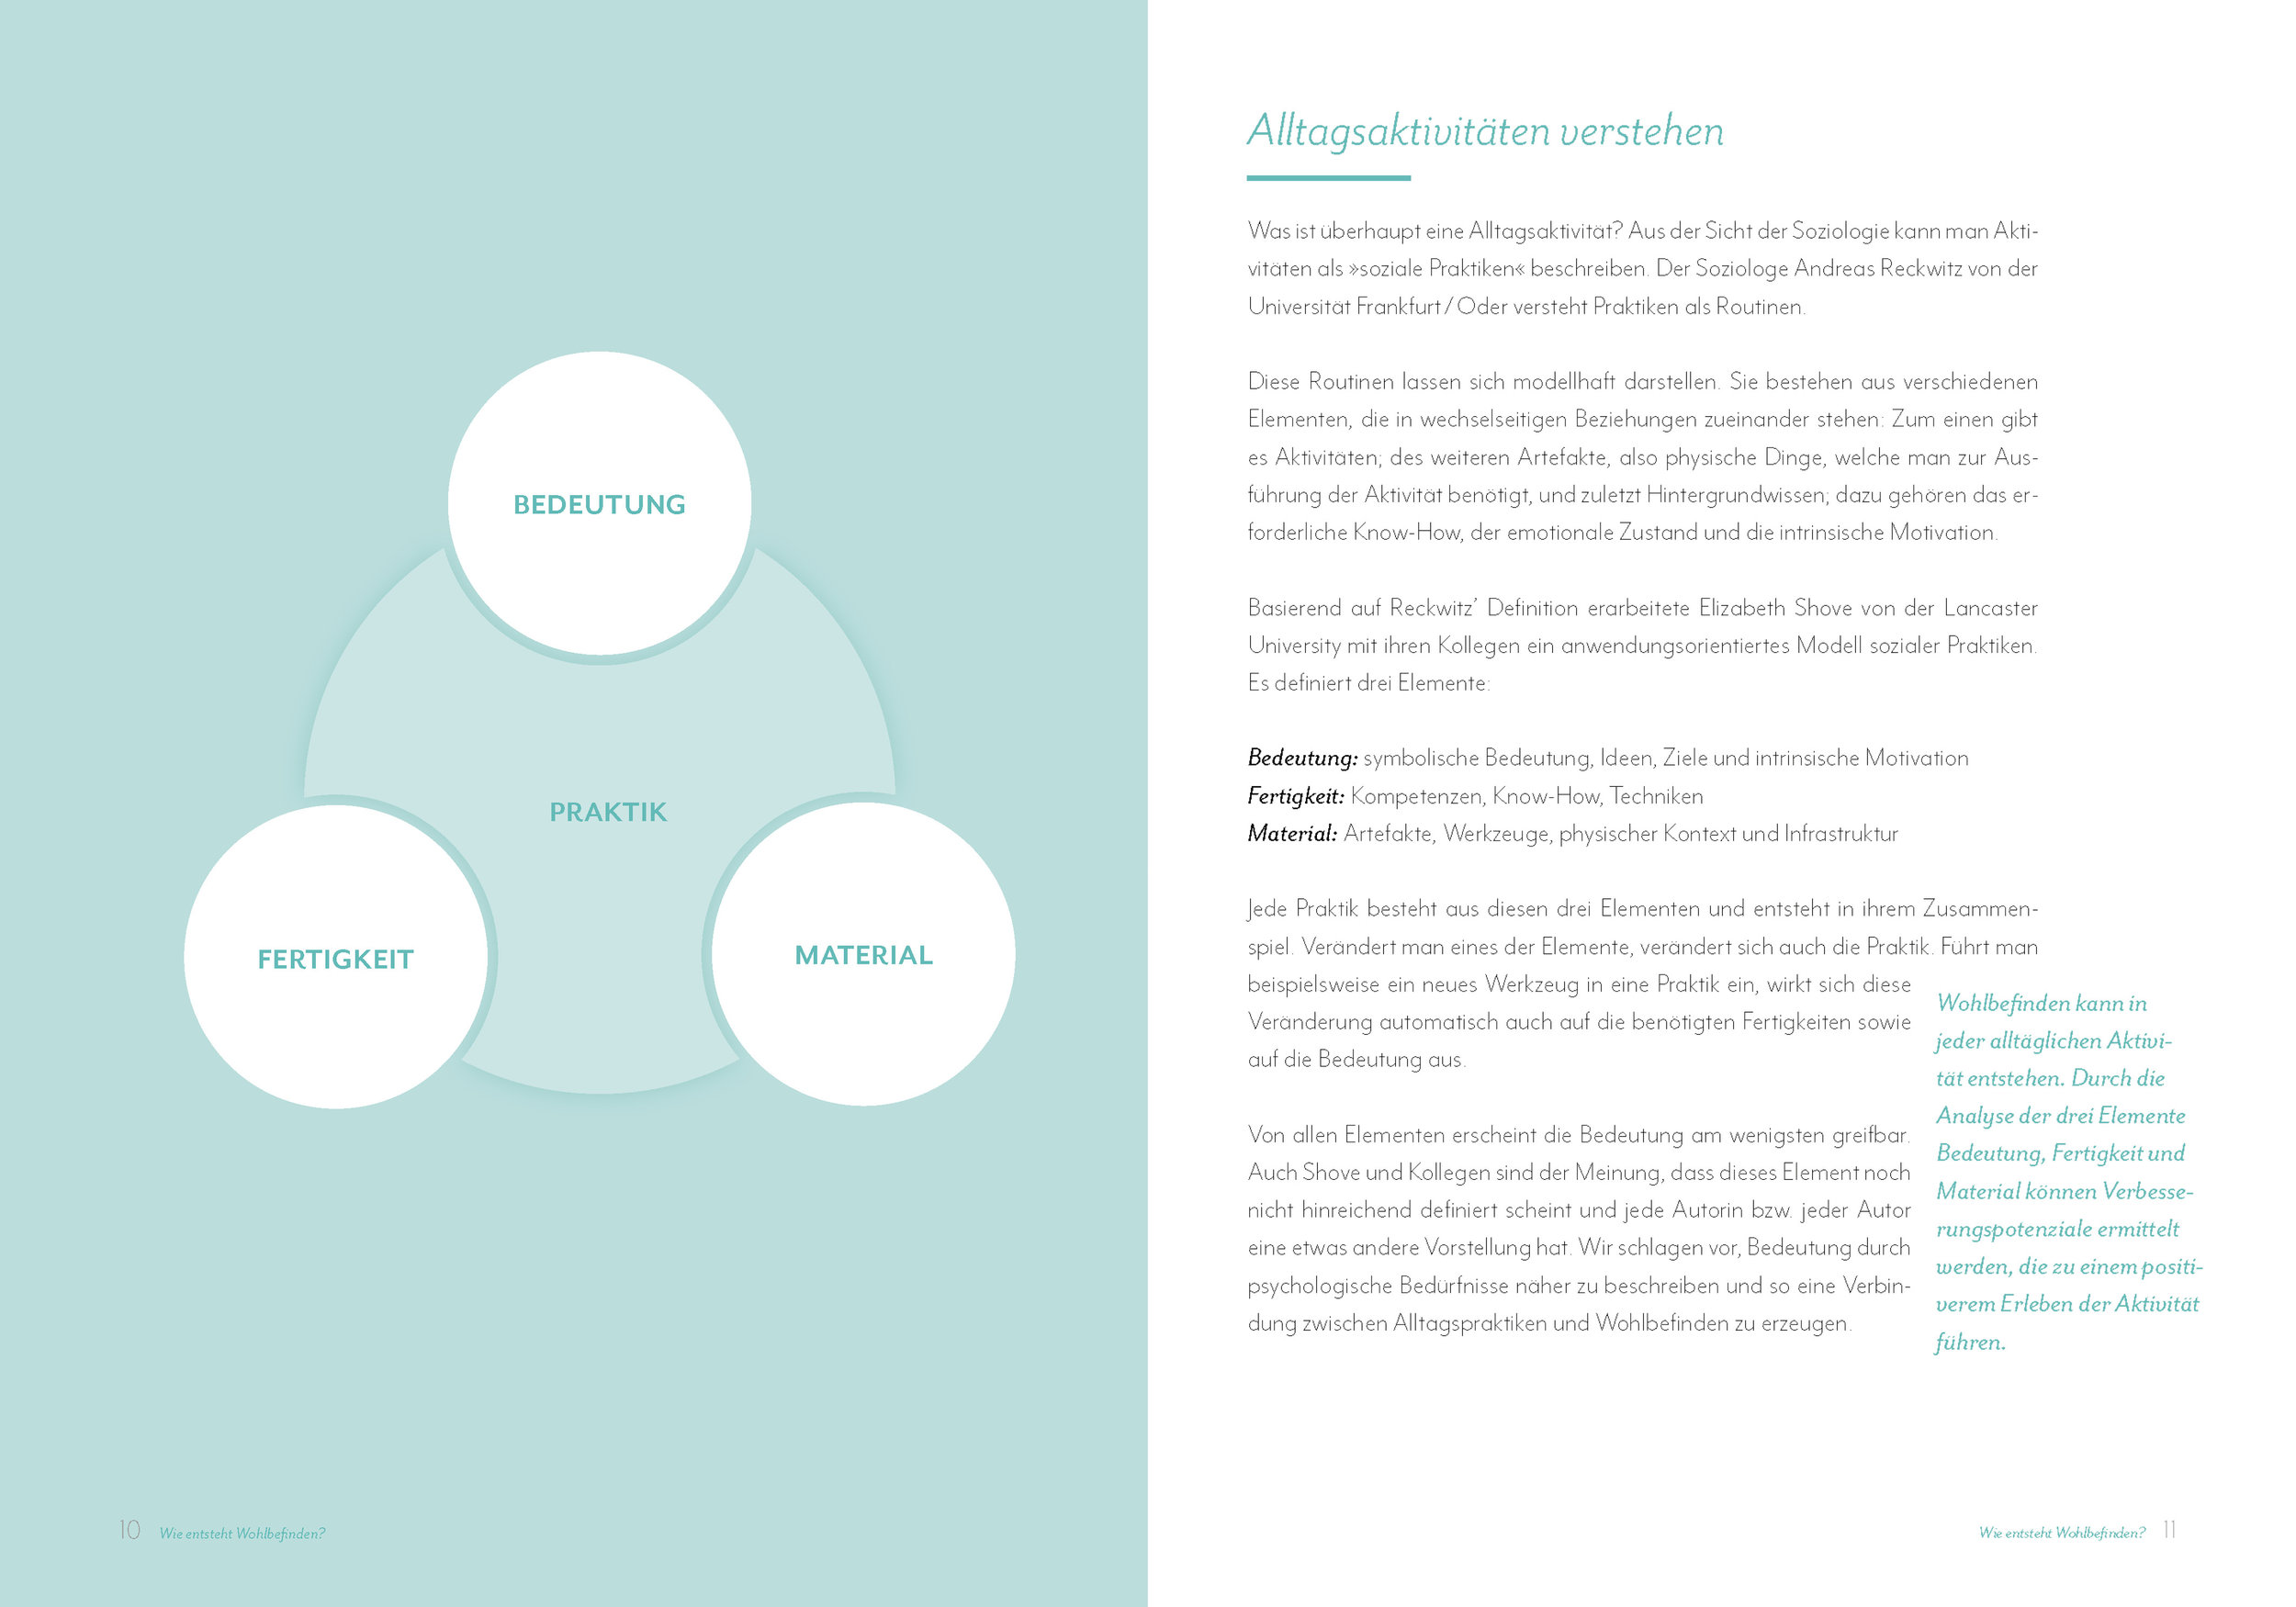 18-11-20 Reference Guide JPGs7.jpg